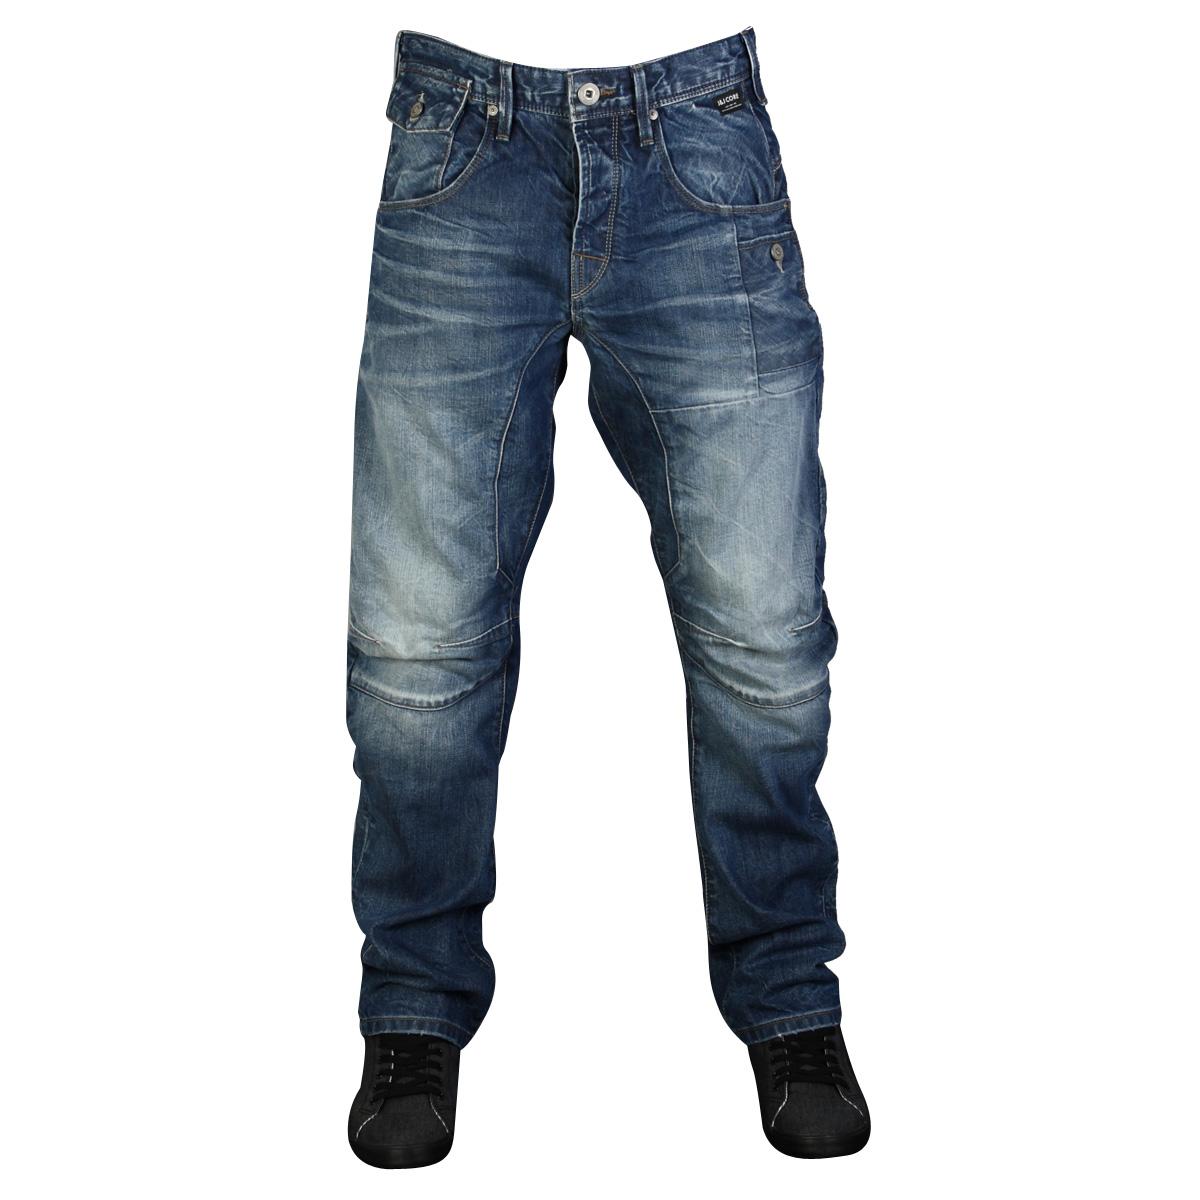 core jack jones stan osaka anti fit denim jeans all waist leg. Black Bedroom Furniture Sets. Home Design Ideas